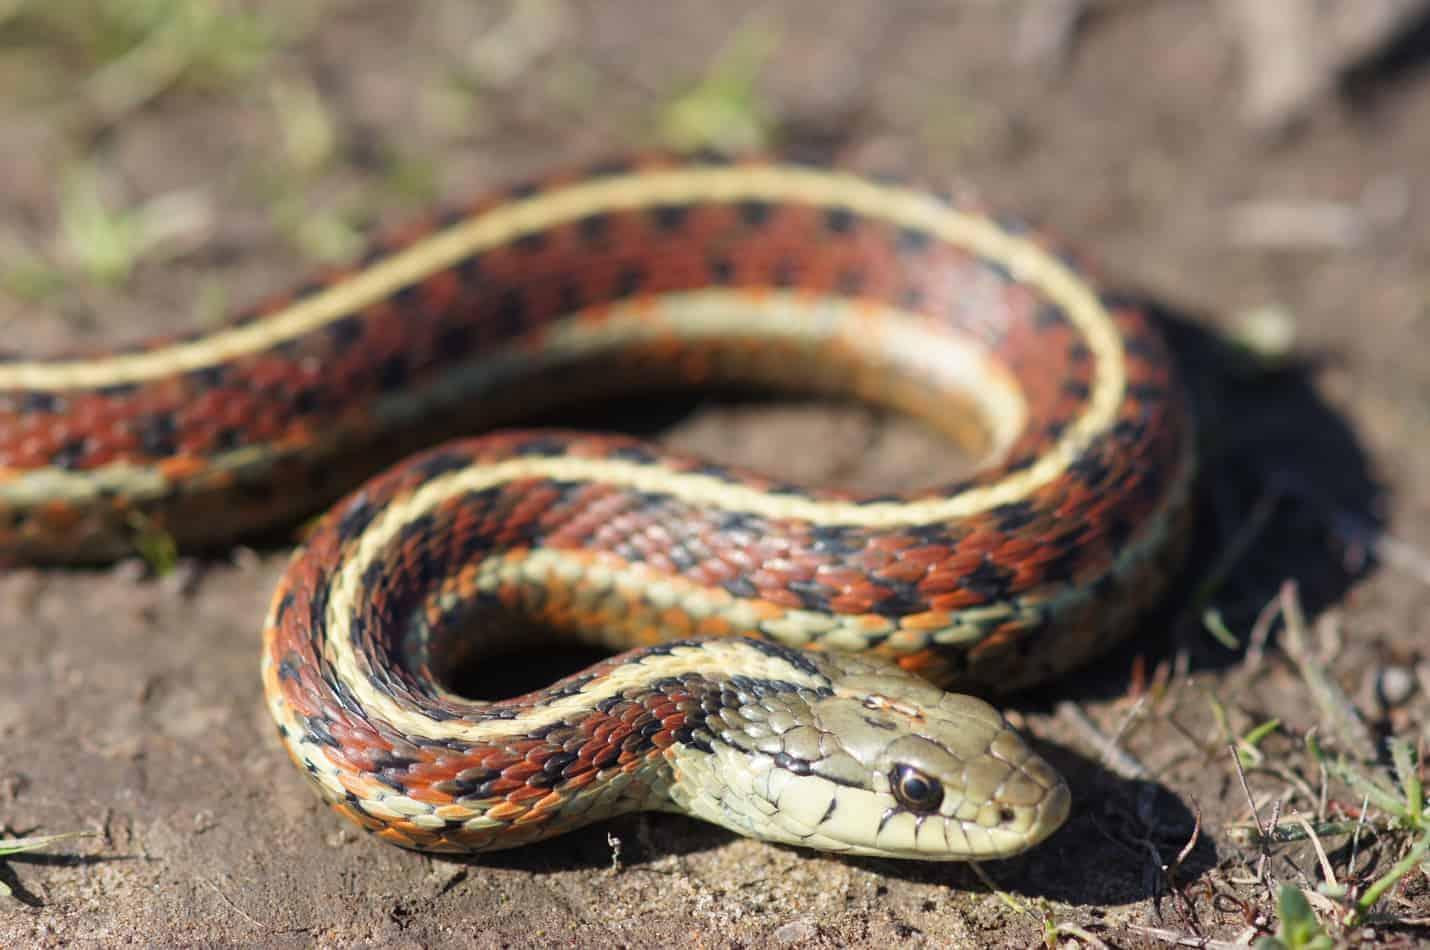 Species Profile: California Red-Sided Garter Snake